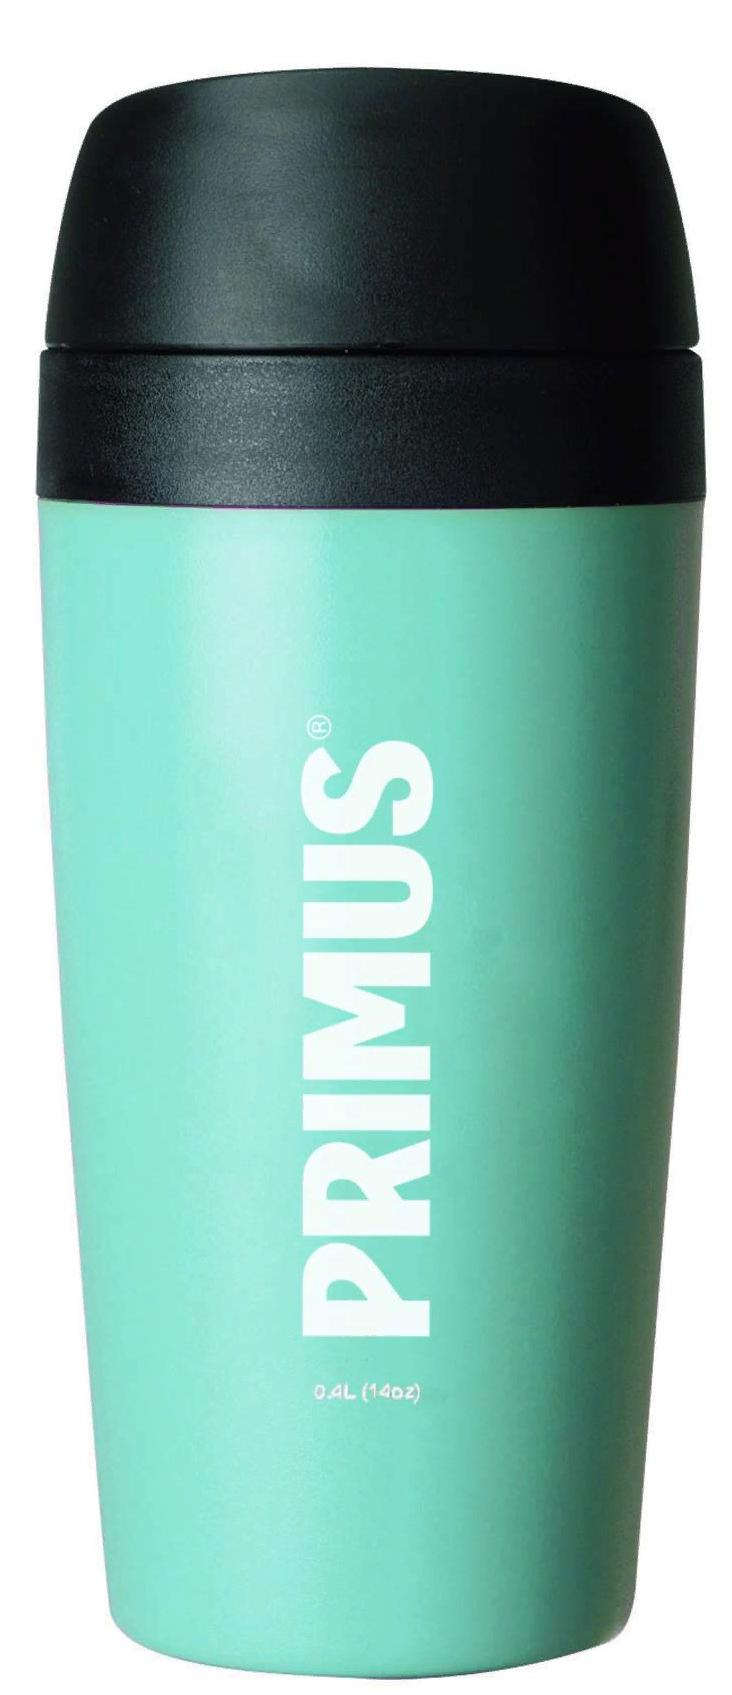 Термокружка Primus Commuter mug 0.4 Pale Blue, Посуда - арт. 1044110196